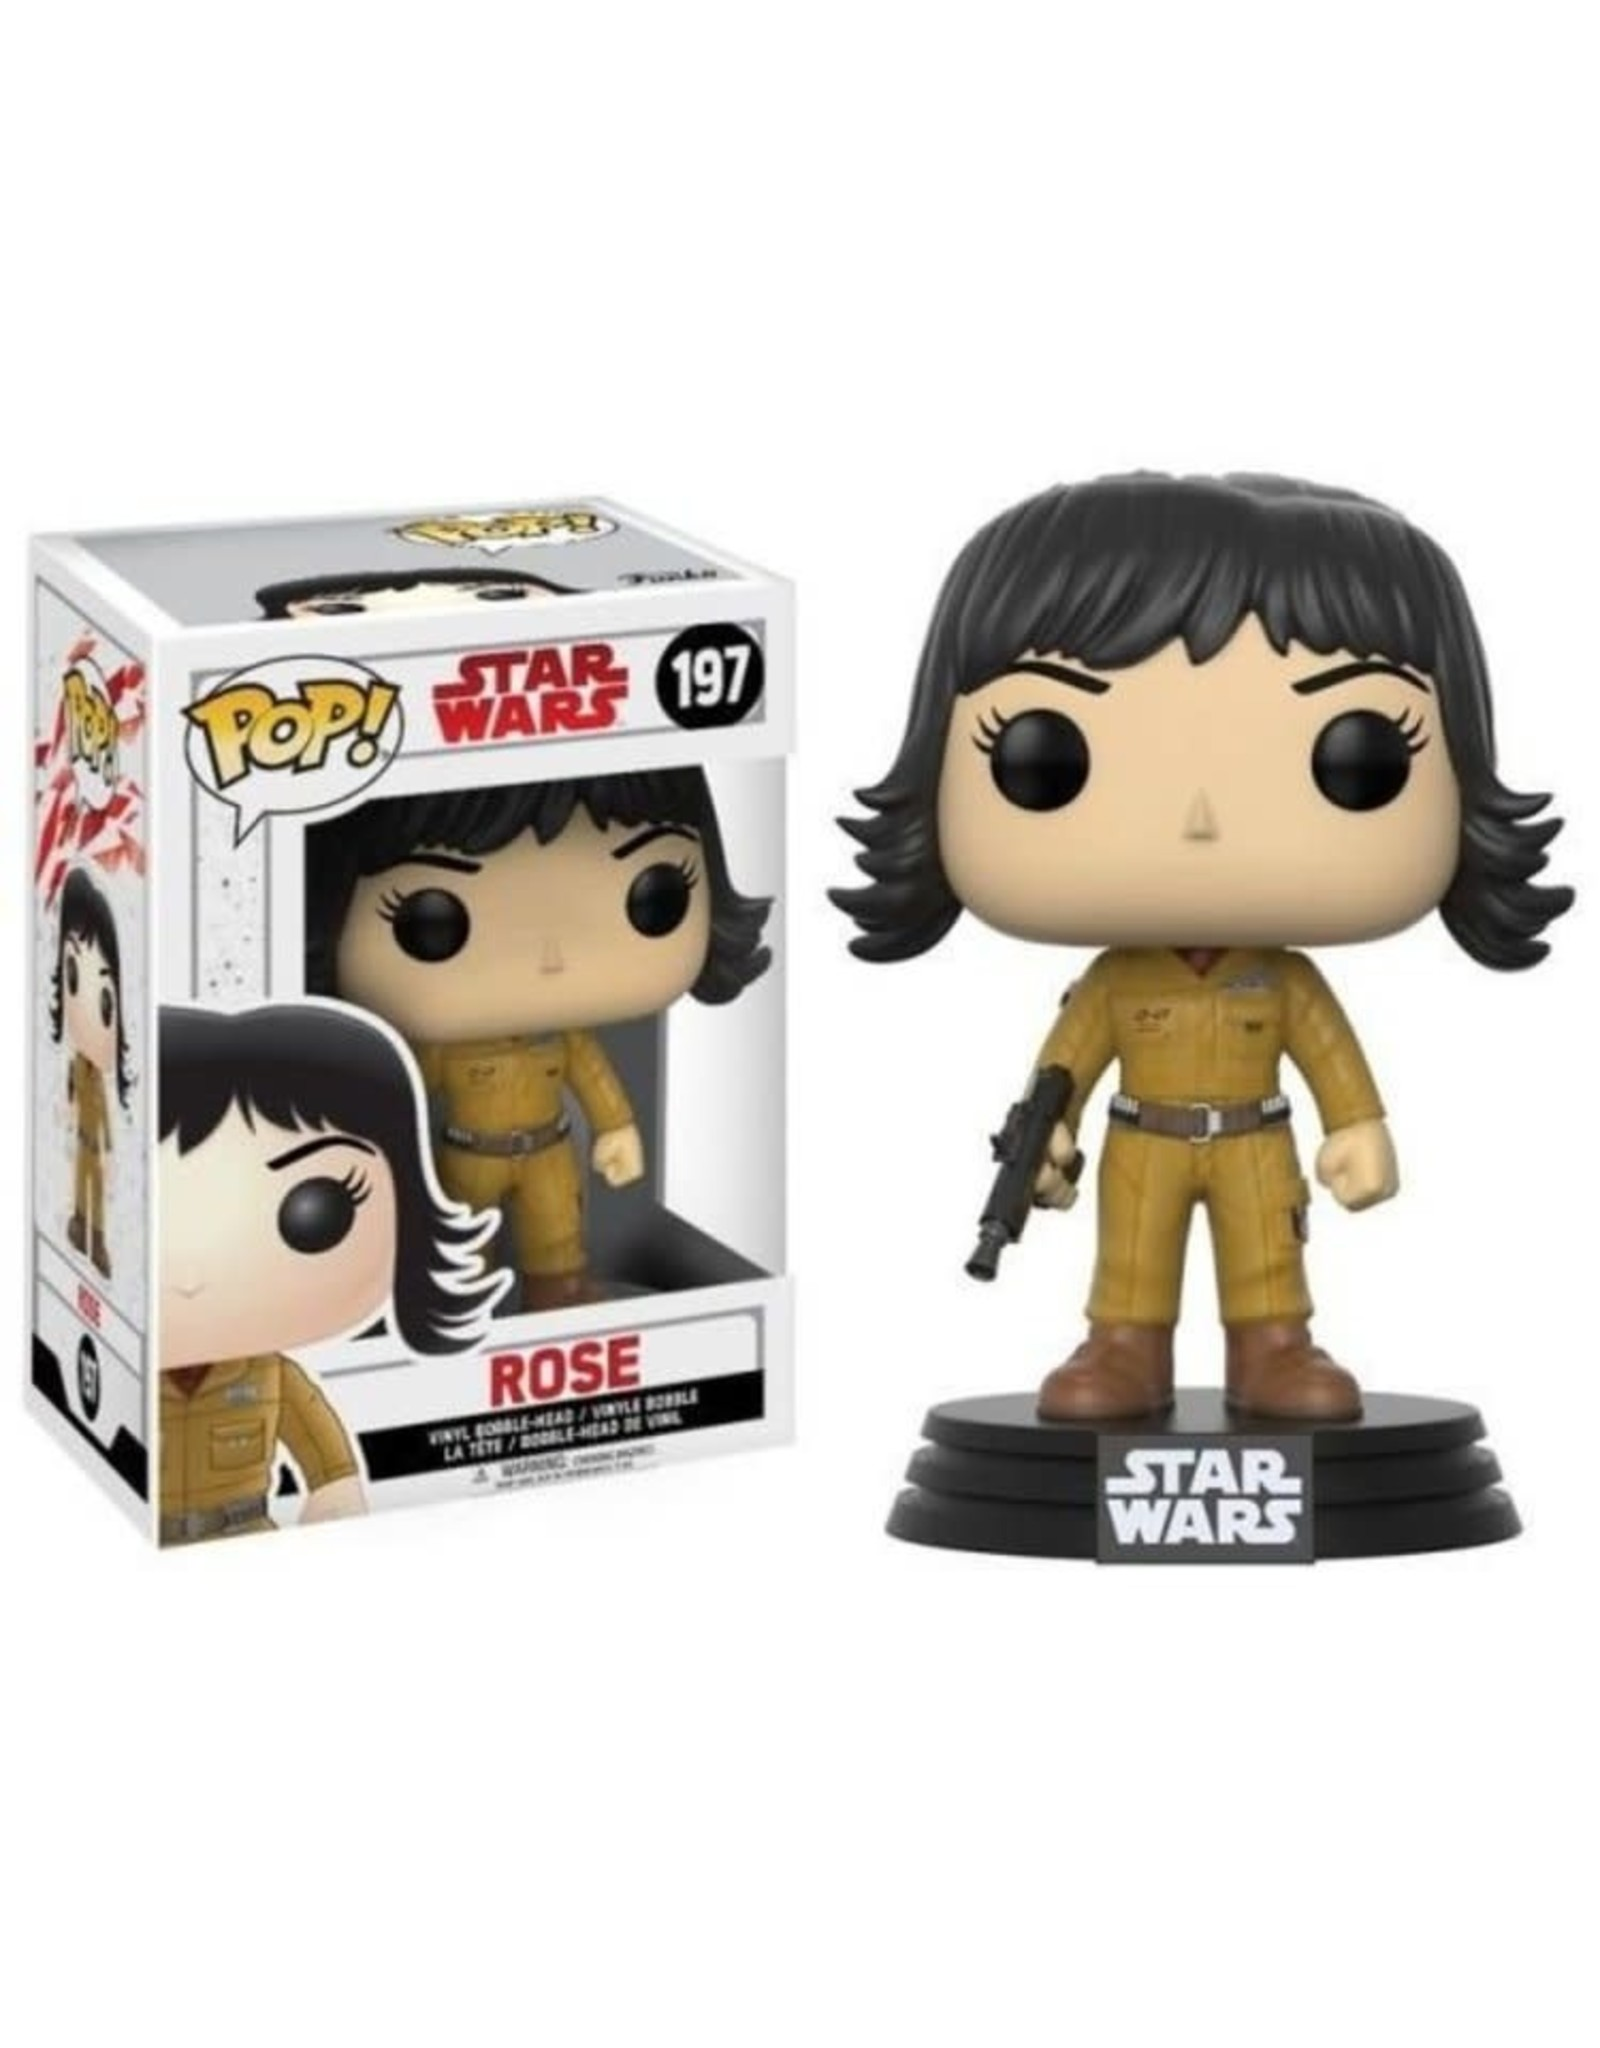 Funko Pop! Funko Pop! Star Wars nr197 Rose